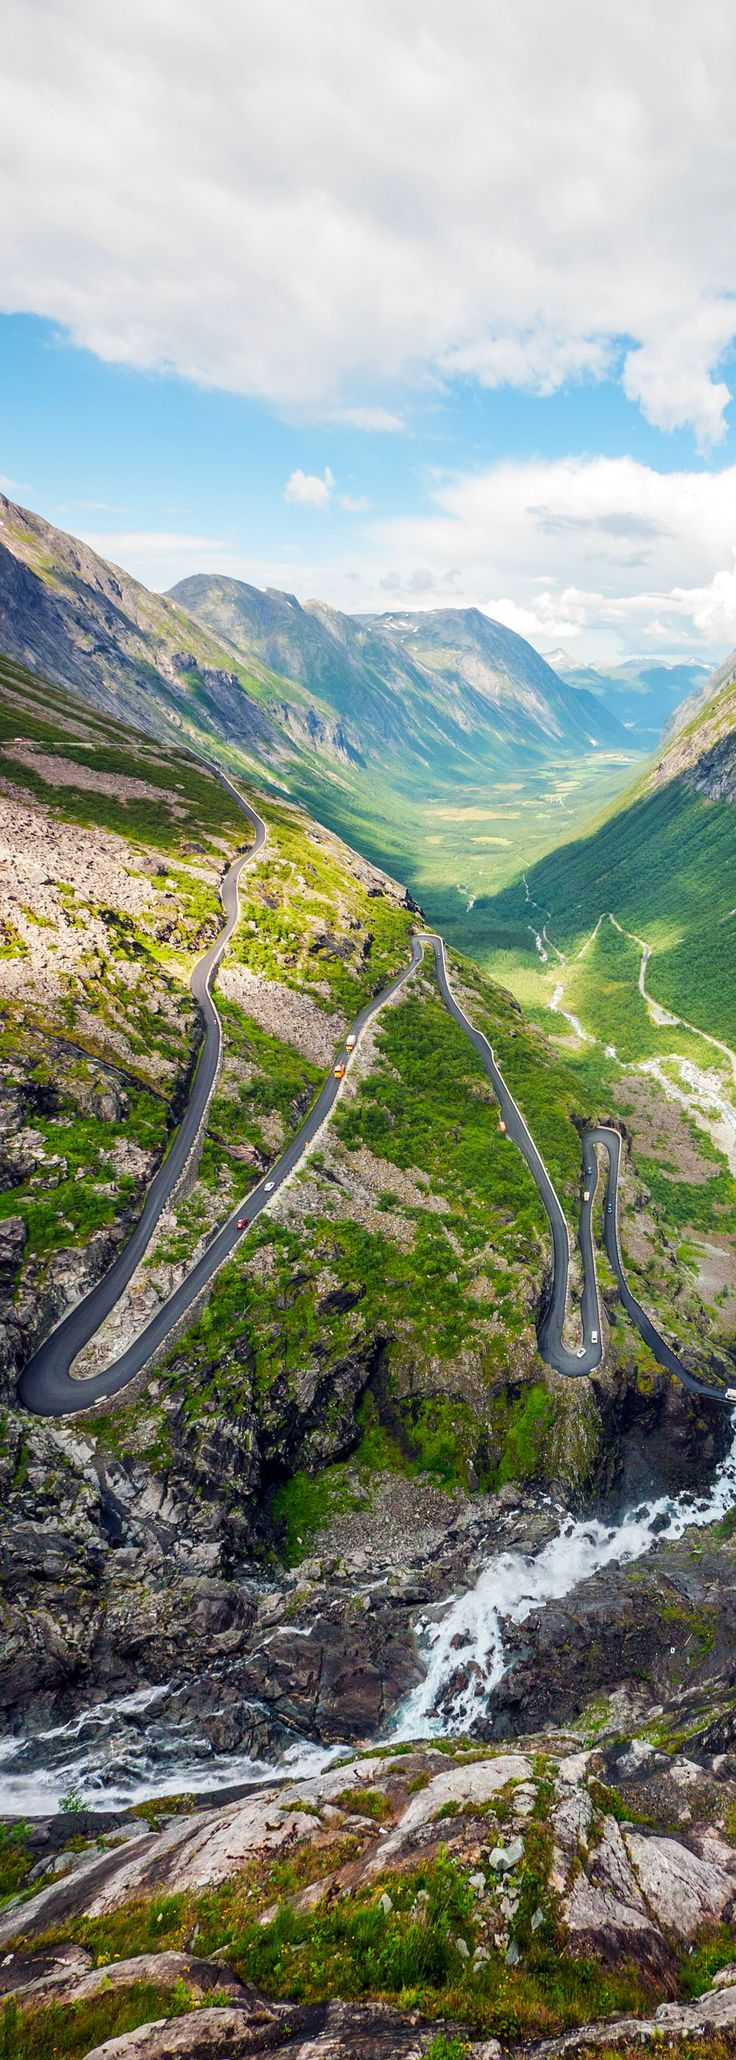 15 reasons why Norway will Rock your World | 5. Trollstigen serpentine mountain road and Stigfossen waterfall. Part of Norwegian National Road 63